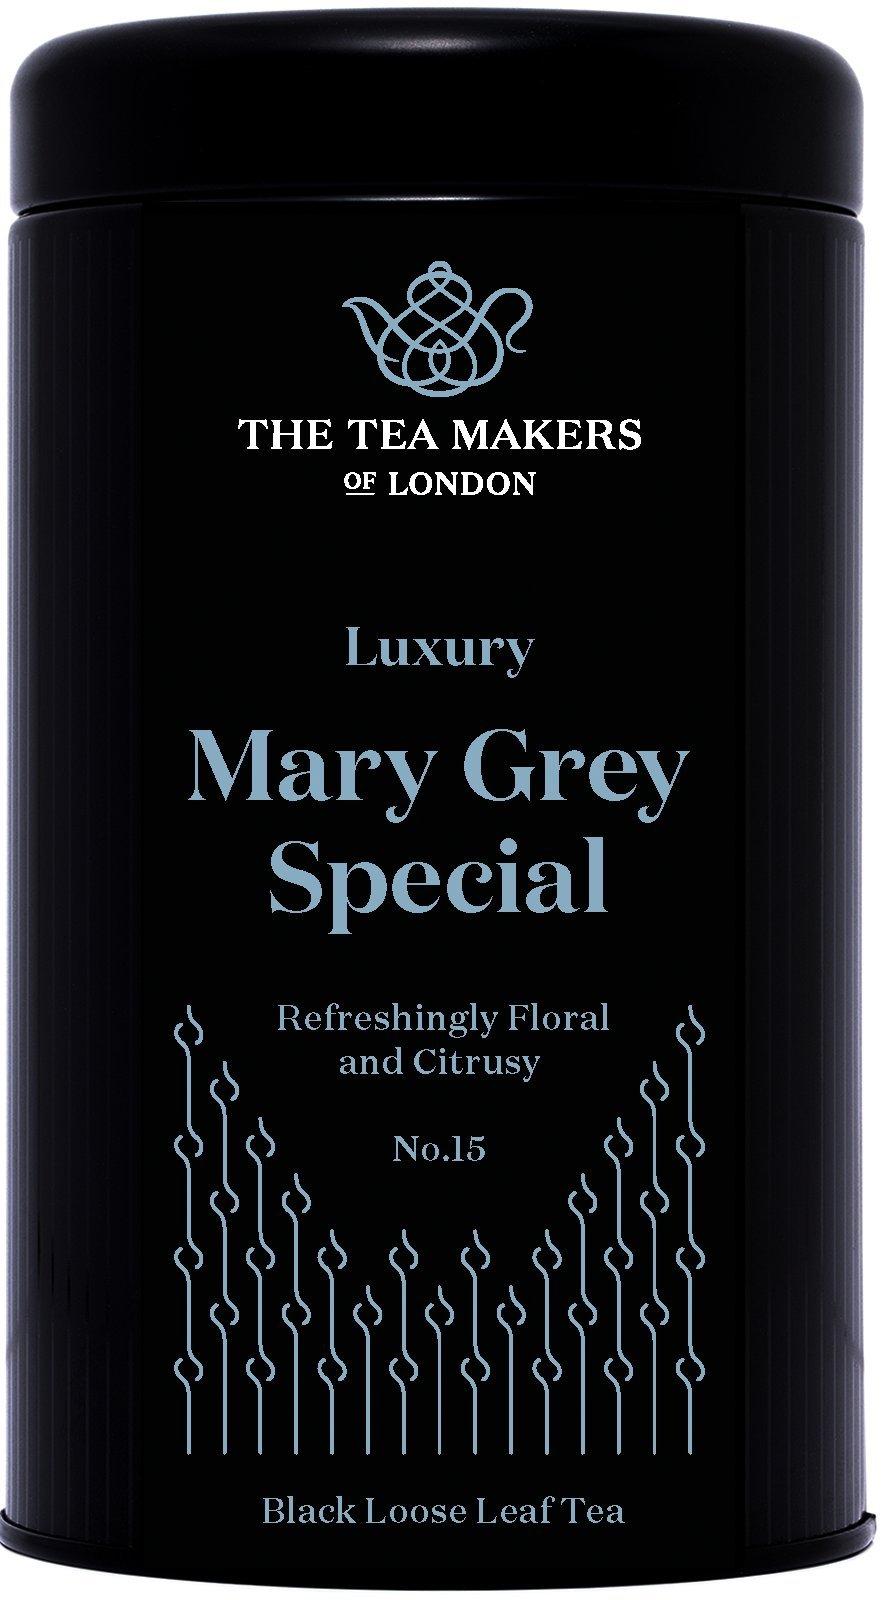 The-Tea-Makers-of-London-hochwertiger-Mary-Grey-Teebltter-scharzer-Tee-von-prmiertem-Teeshop-Geschenkidee-1er-Pack-1-x-125-g